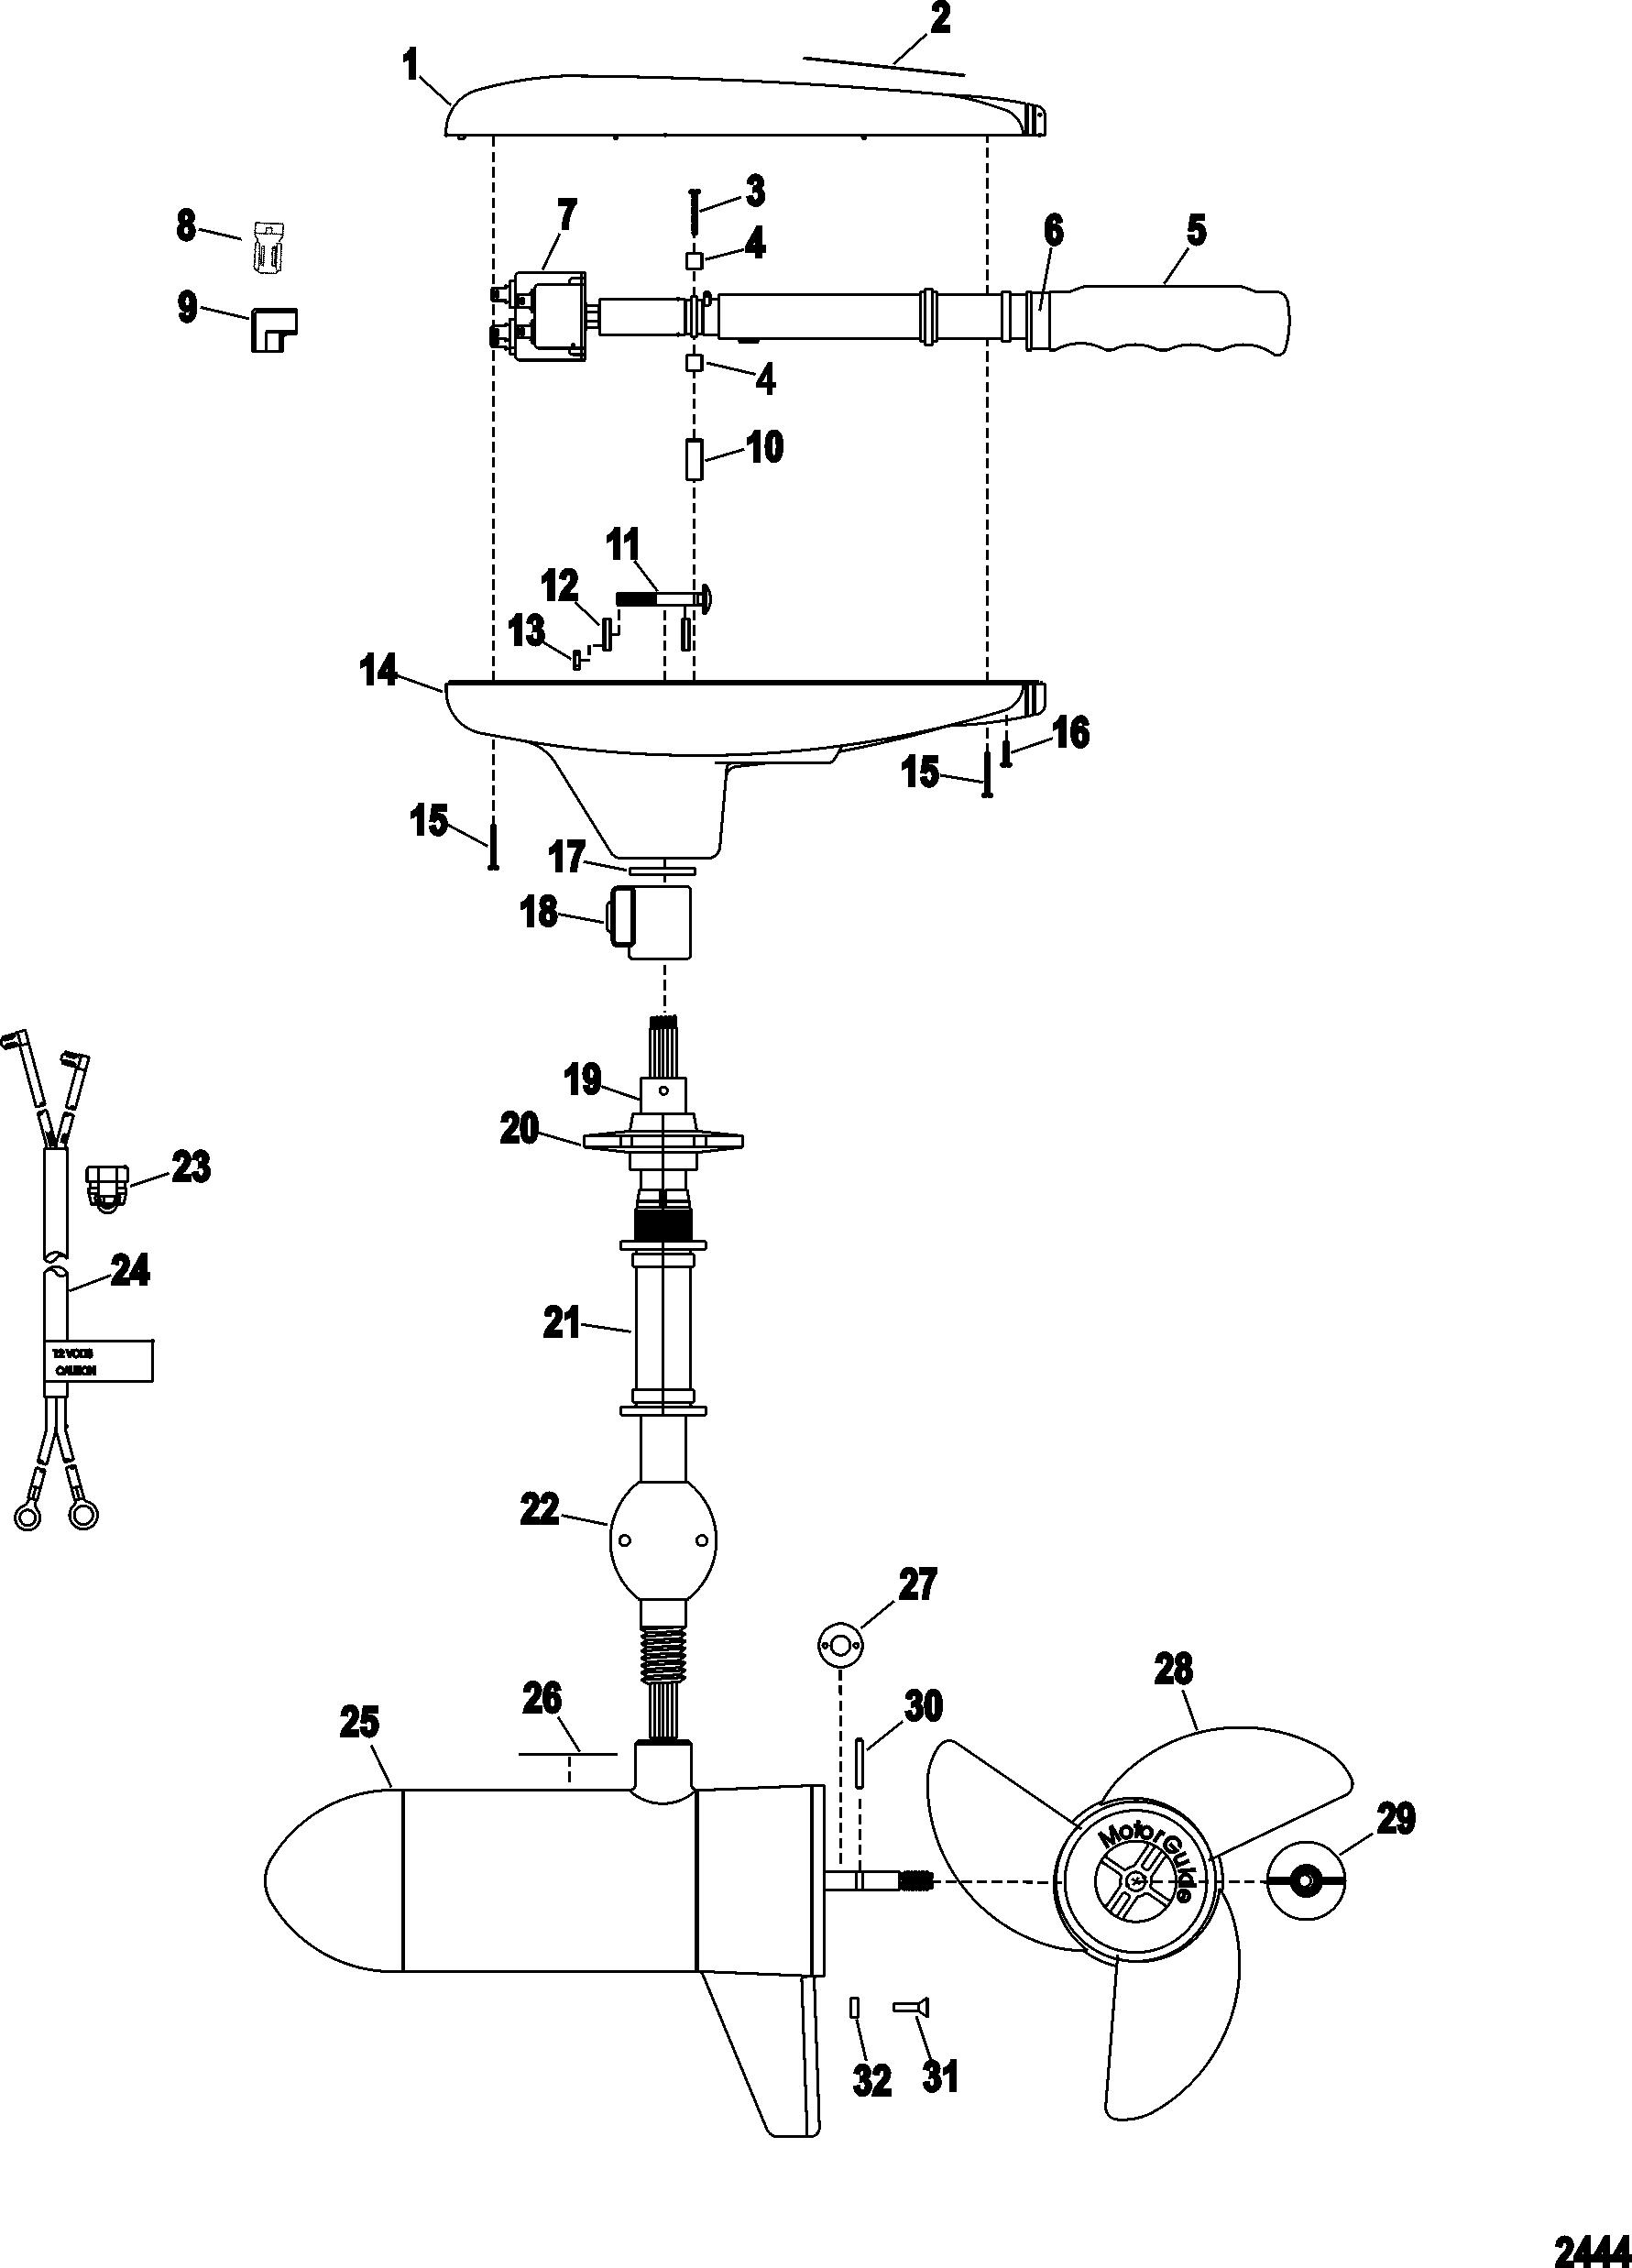 2444?resize=680%2C945&ssl=1 motorguide 3 prong wiring diagram minn kota wiring diagram, 24v 24v trolling motor wiring diagram at mifinder.co